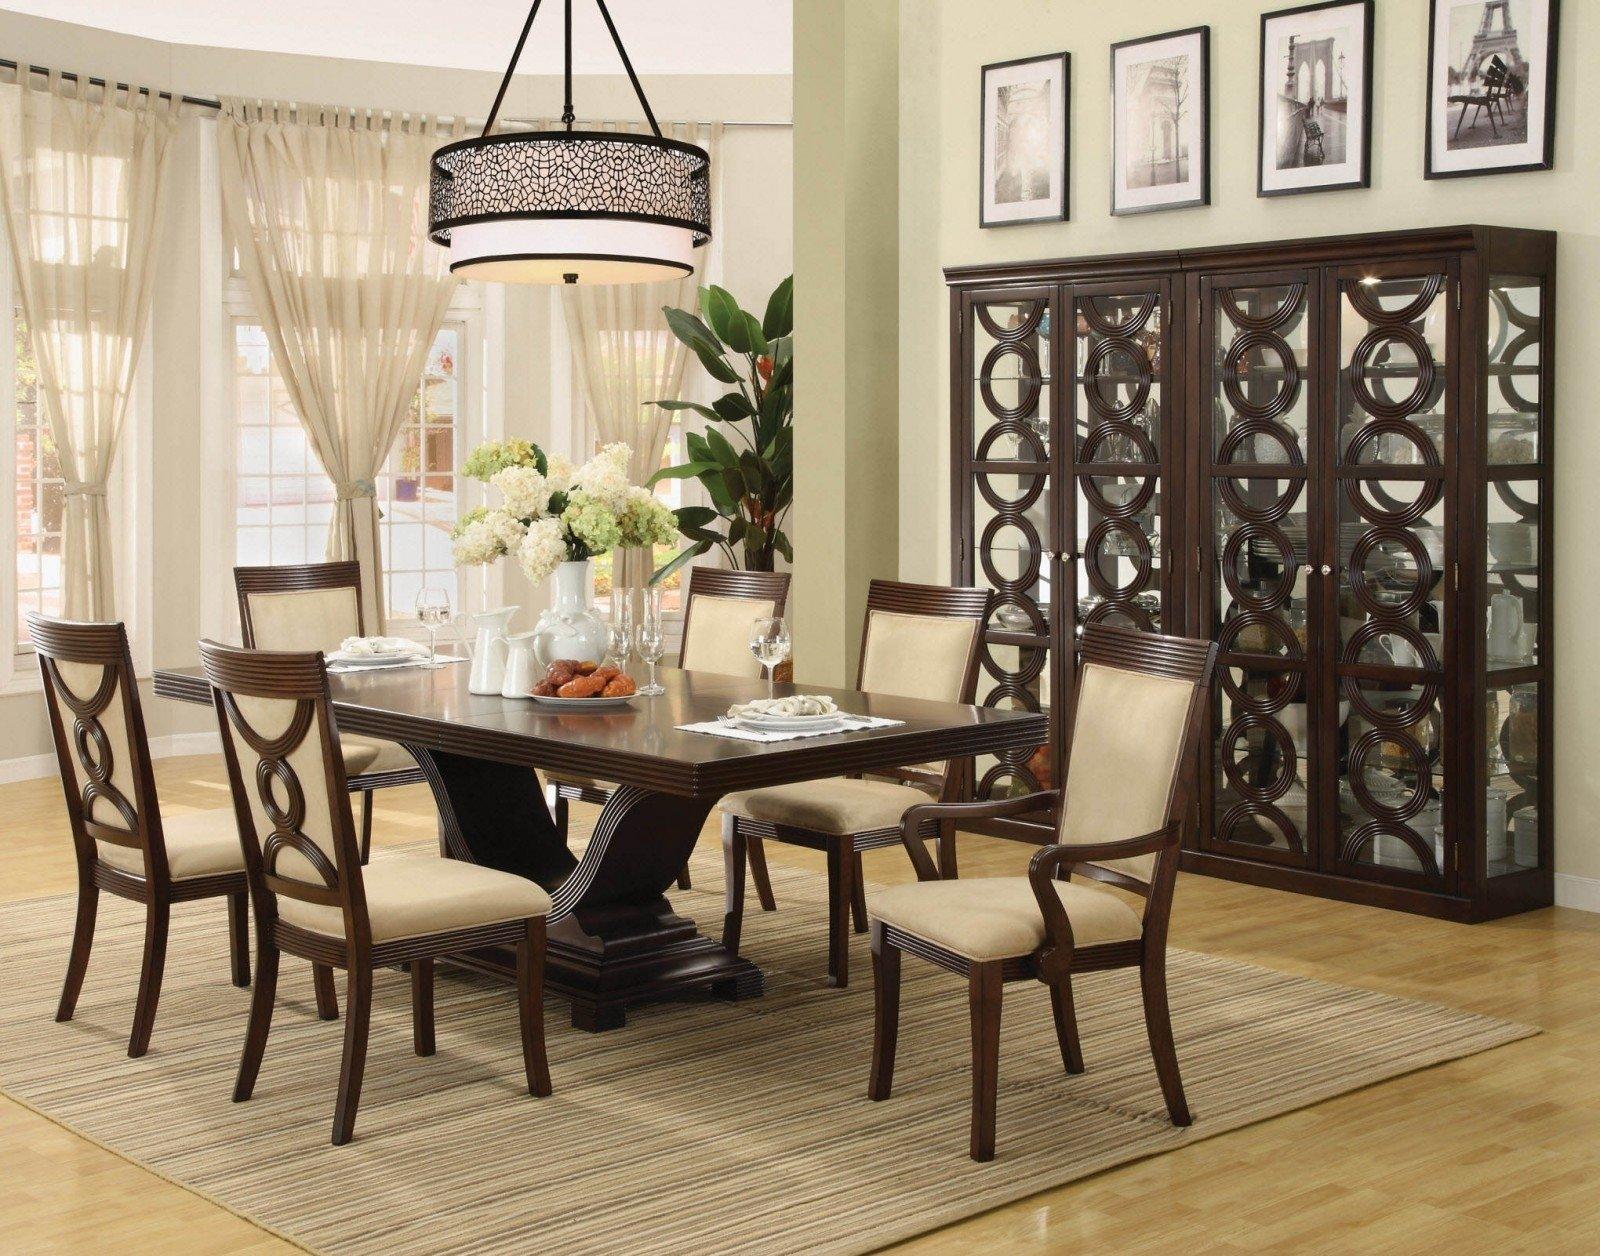 10 Trendy Dining Room Table Decor Ideas dining room table decorating ideas 15 hgtv with scenic images 1 2020